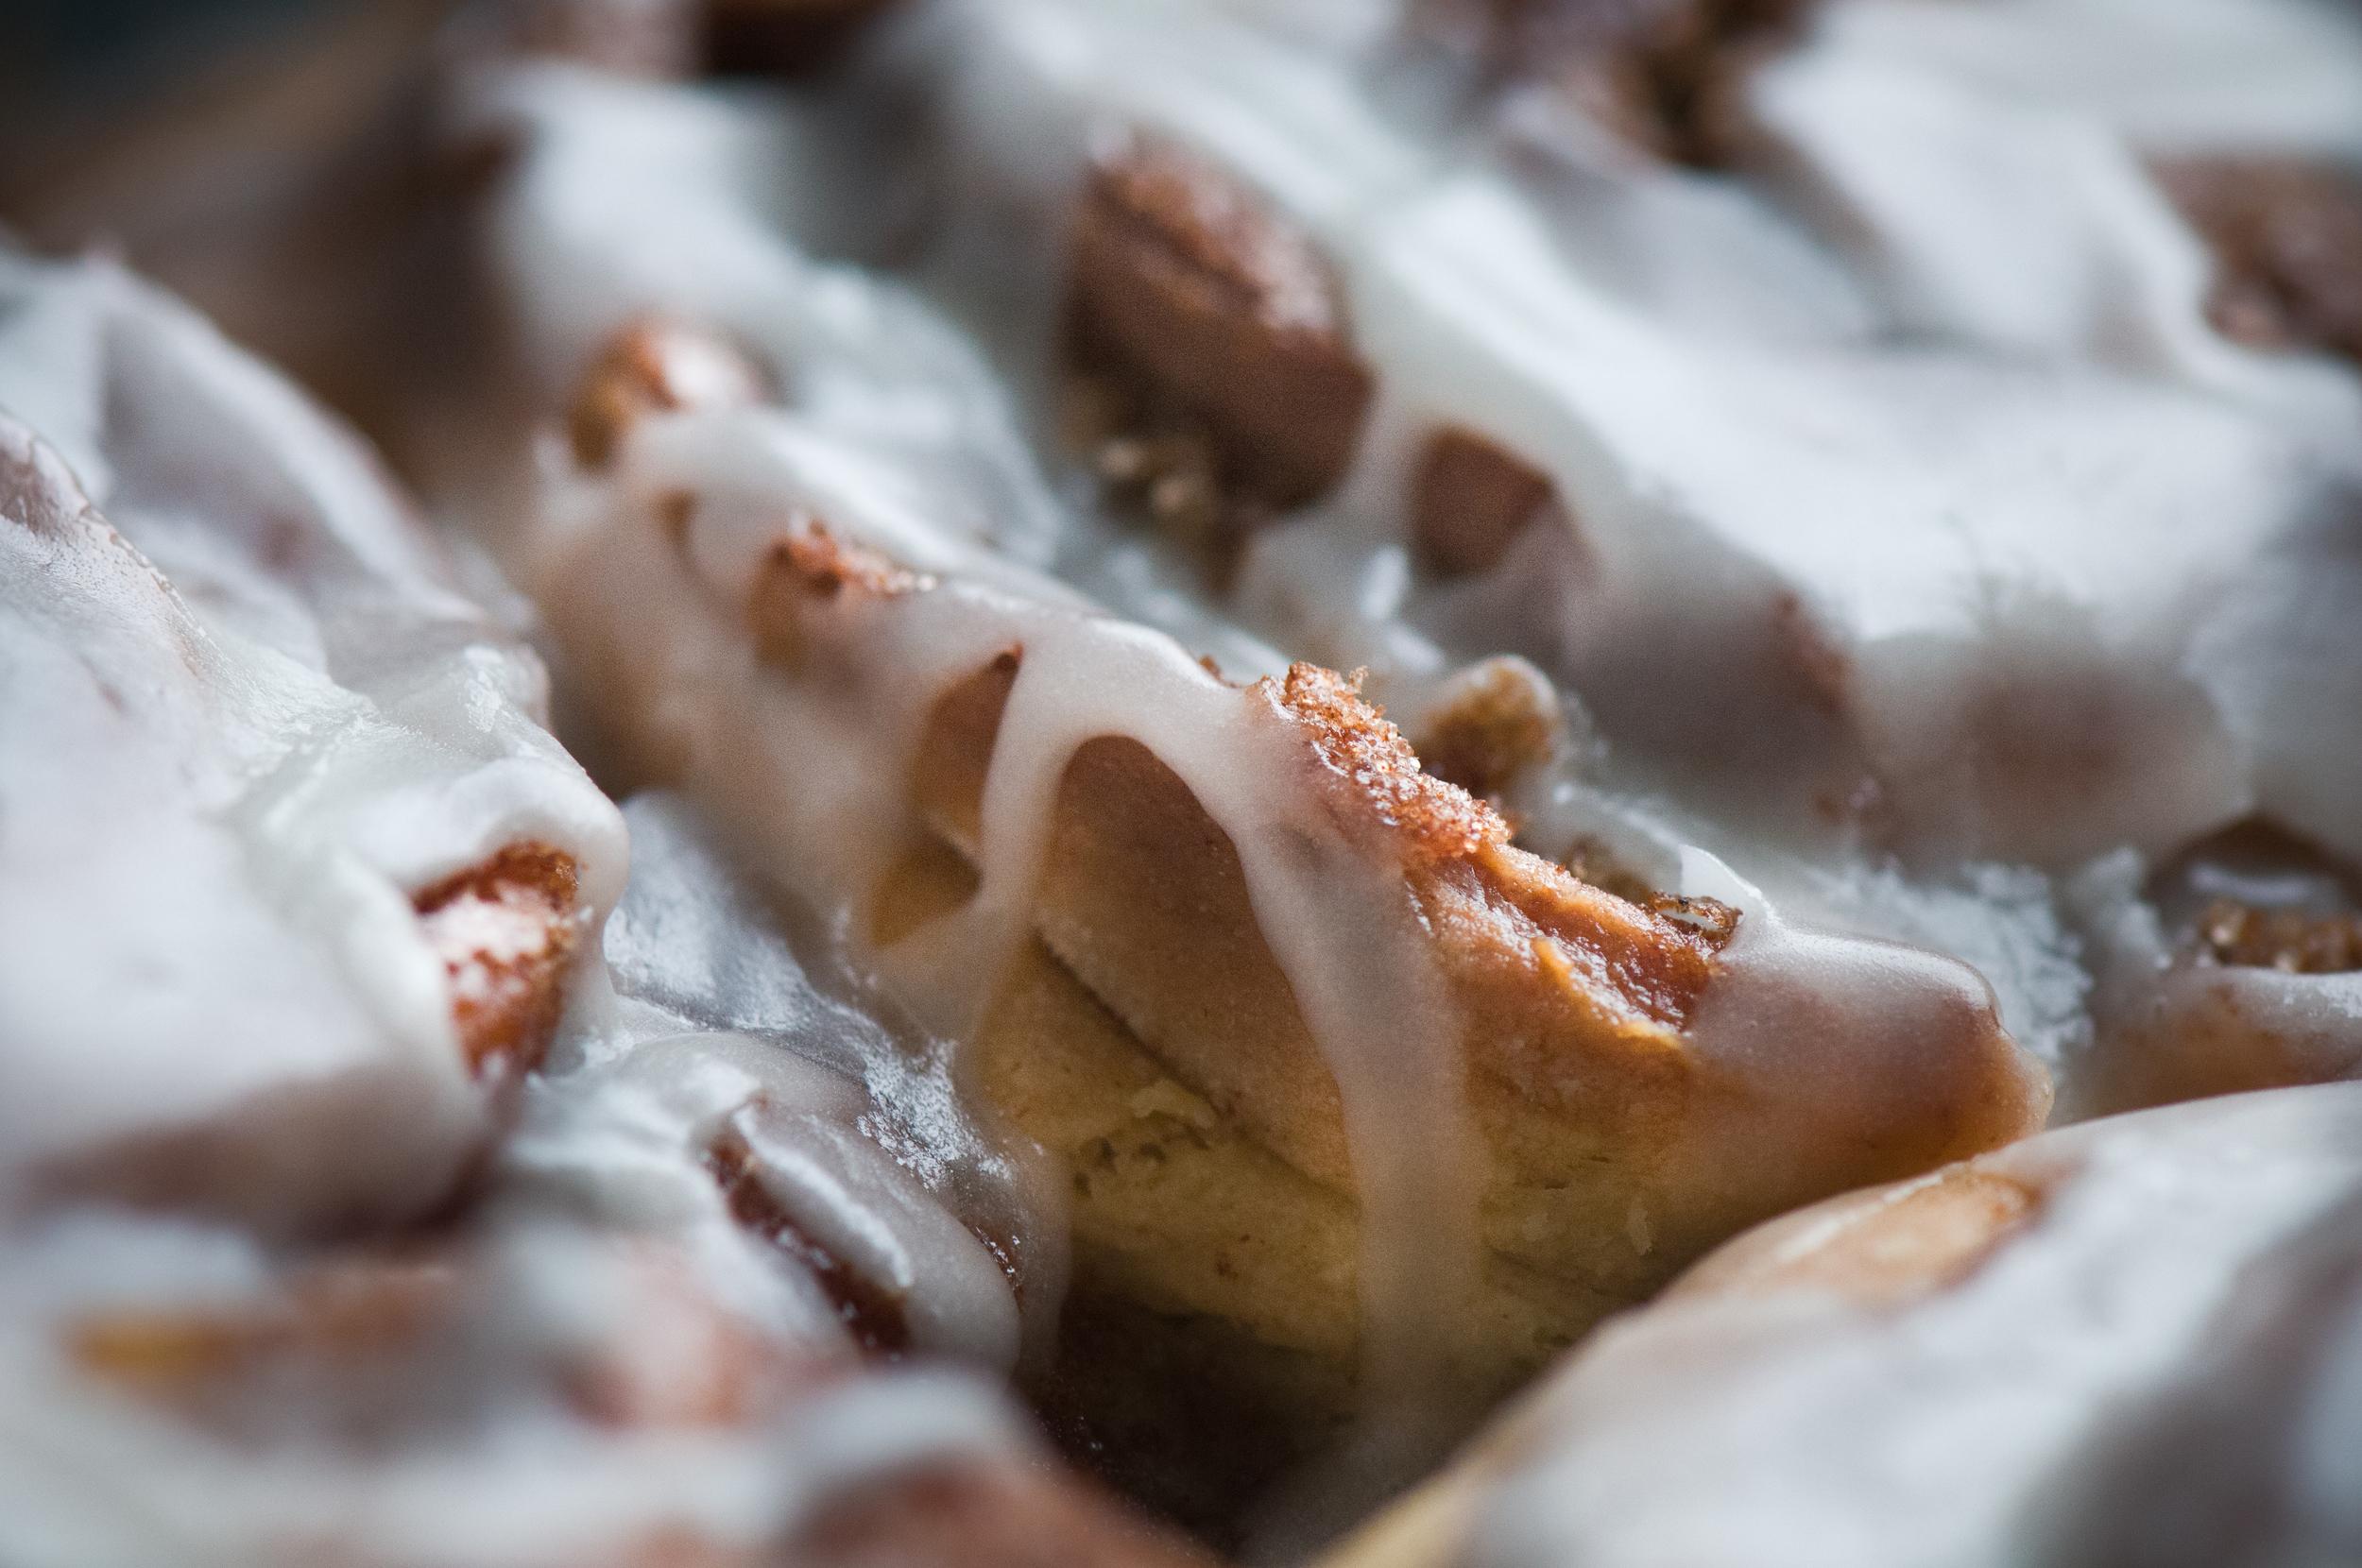 michelle food cinnamon buns 2.jpg